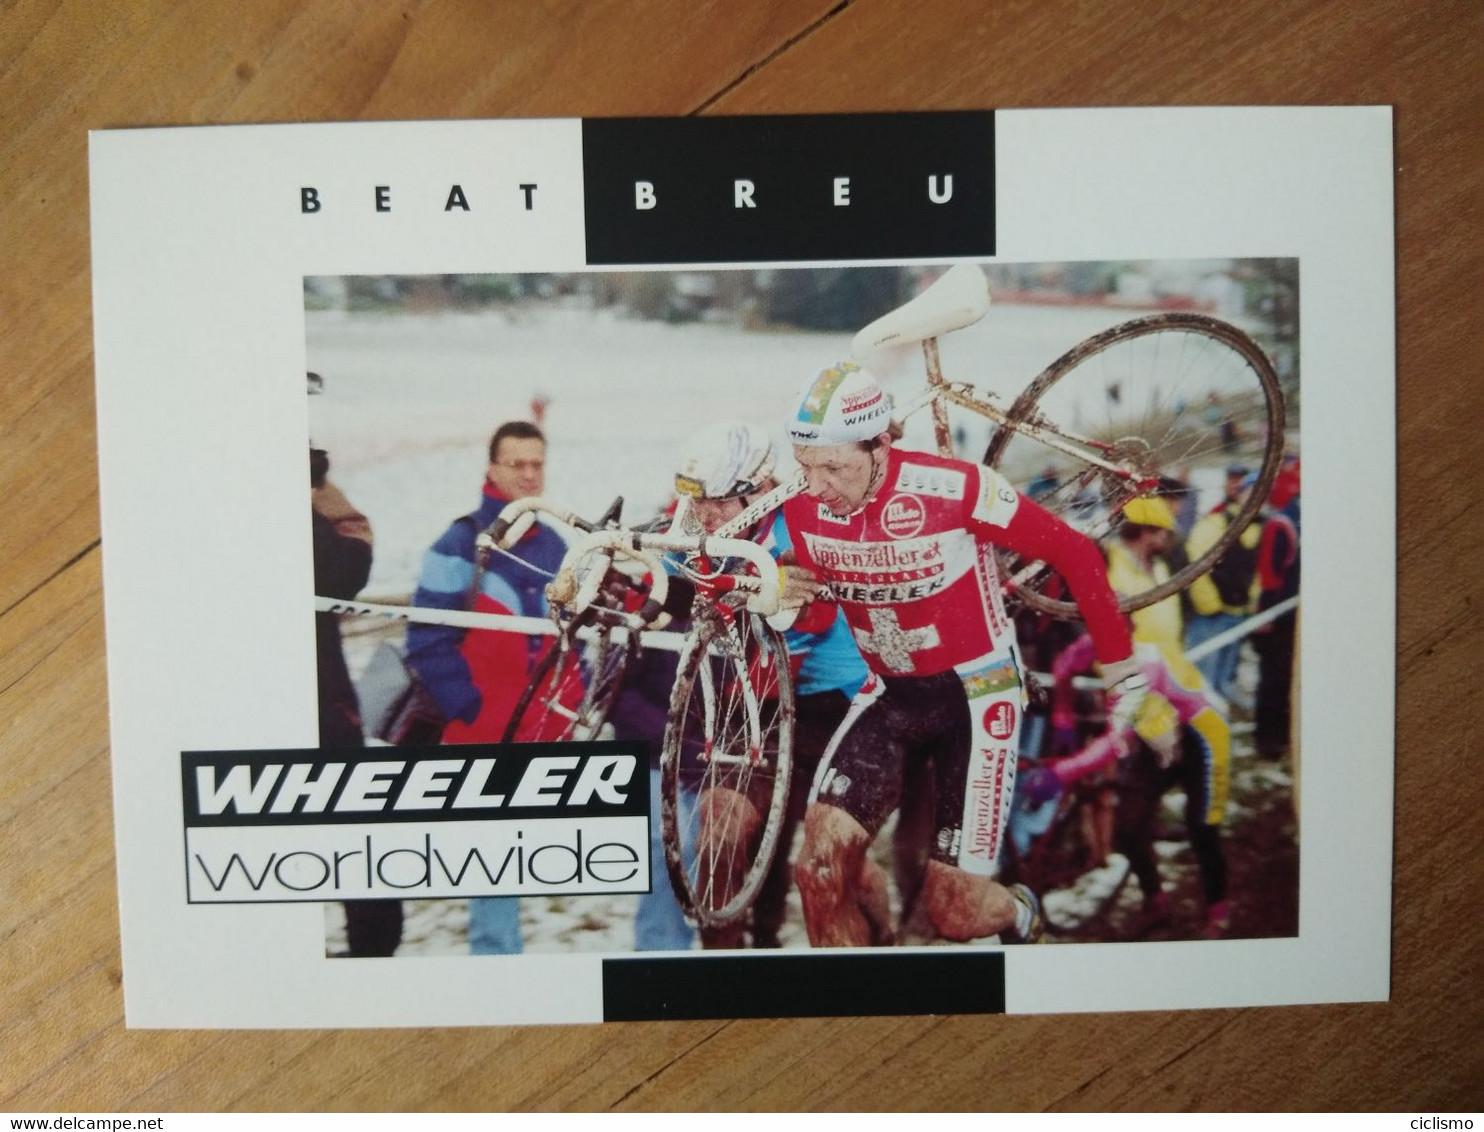 Cyclisme - Carte Publicitaire WHEELER 1994 : Beat BREU - Cycling